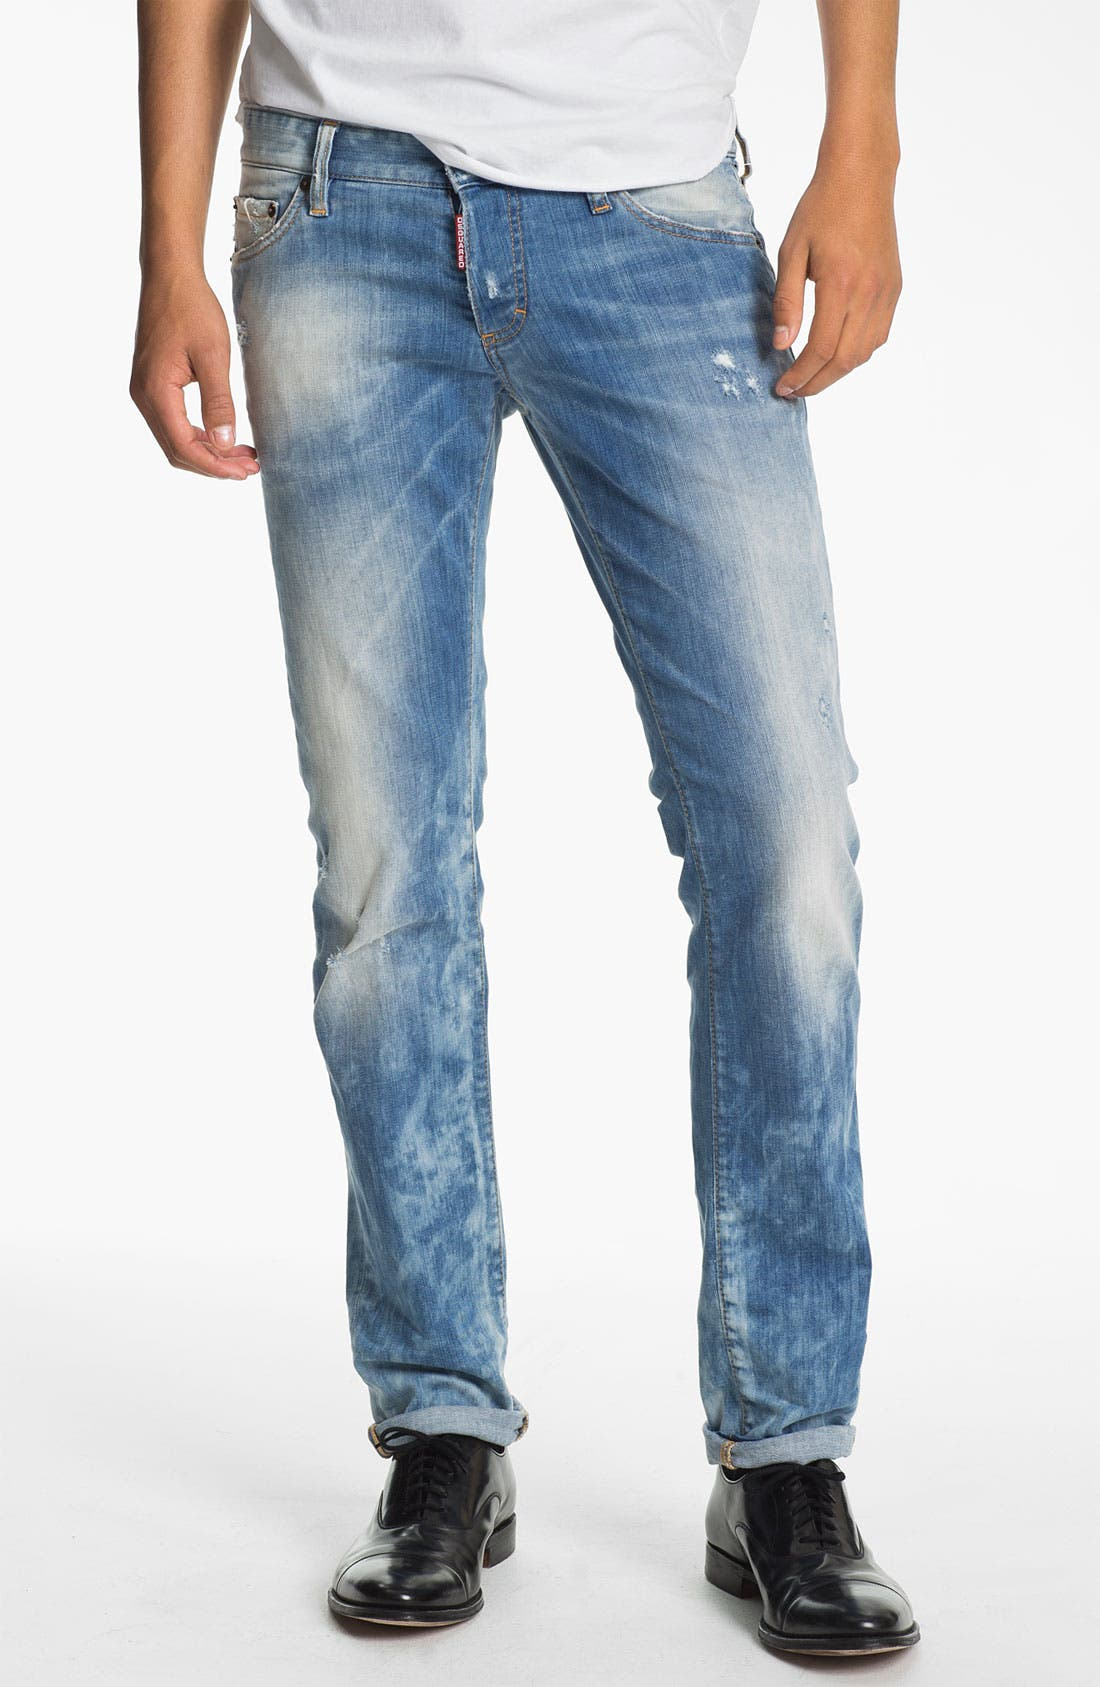 Alternate Image 1 Selected - Dsquared2 Slim Fit Jeans (Bleach Blue)